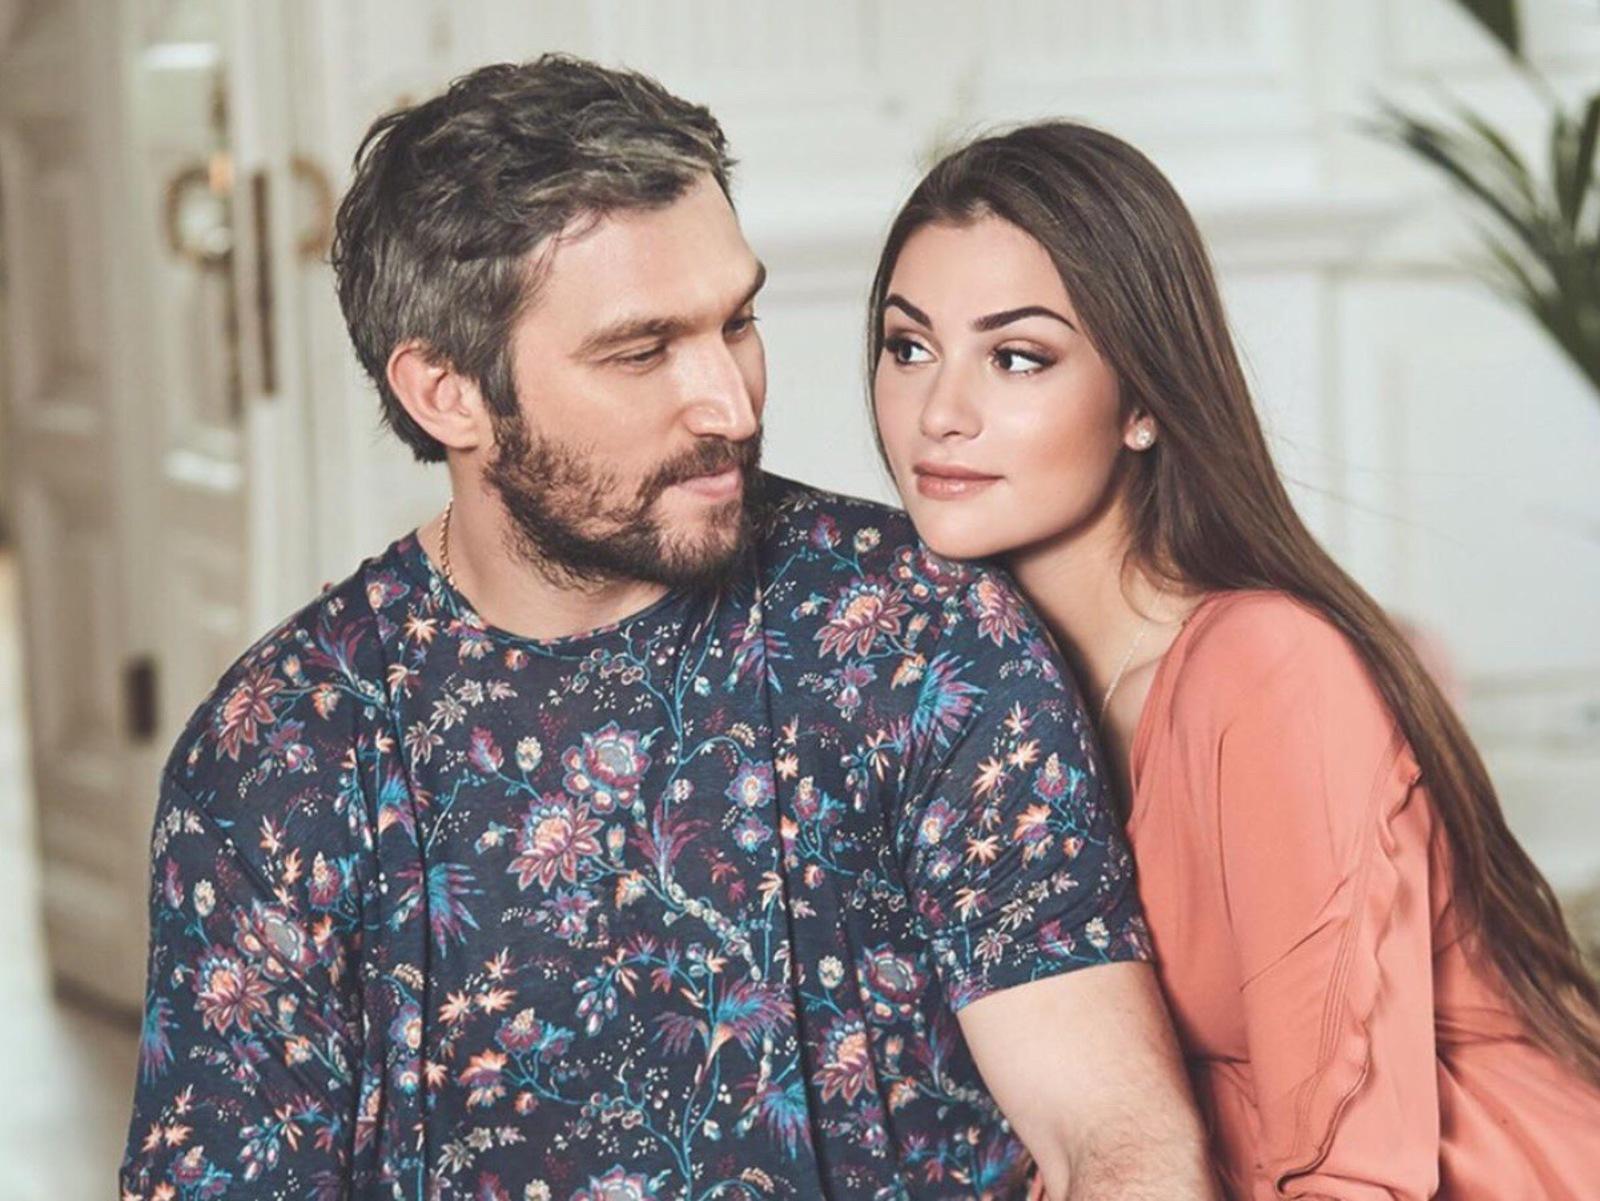 Александр Овечкин и Анастасия Шубская воспитывают сына Сергея